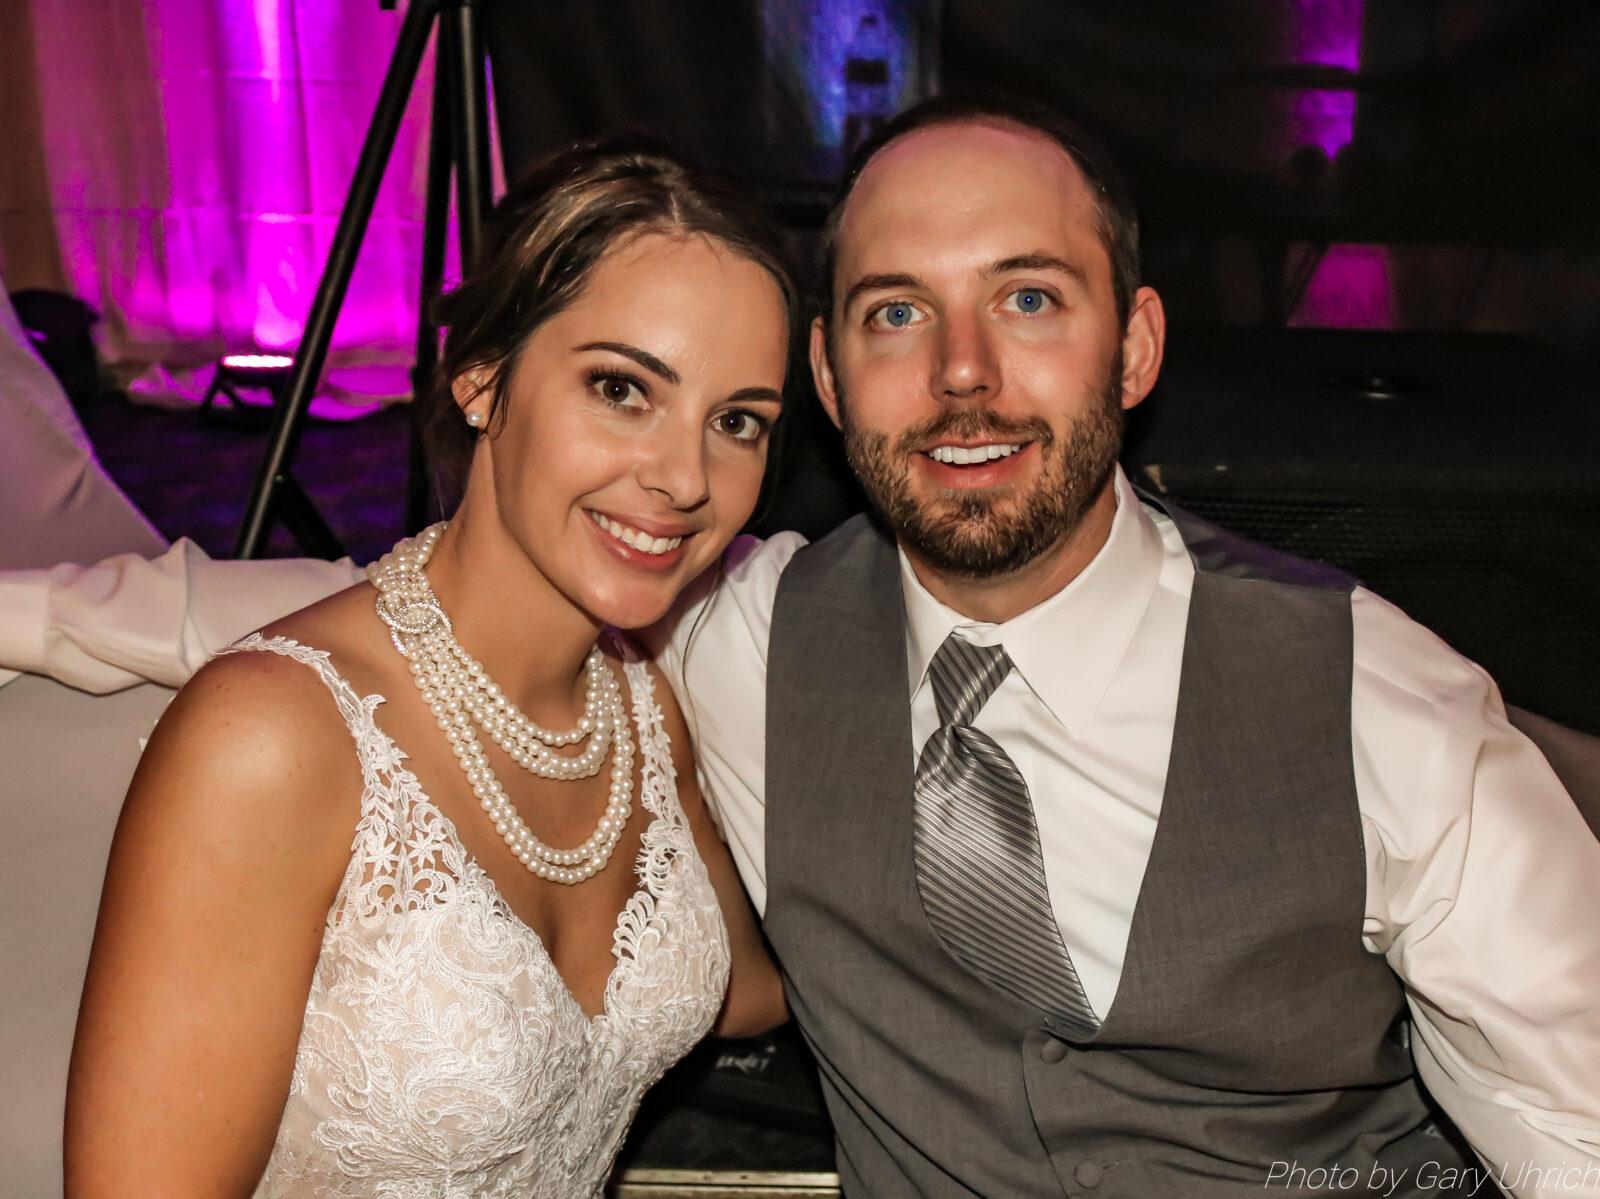 The DJ Music System, Scottsbluff, Nebraska, Wedding DJ Service, Gary Uhrich, Bride and Groom, Wedding Venue, Wedding Dress, Tuxedo